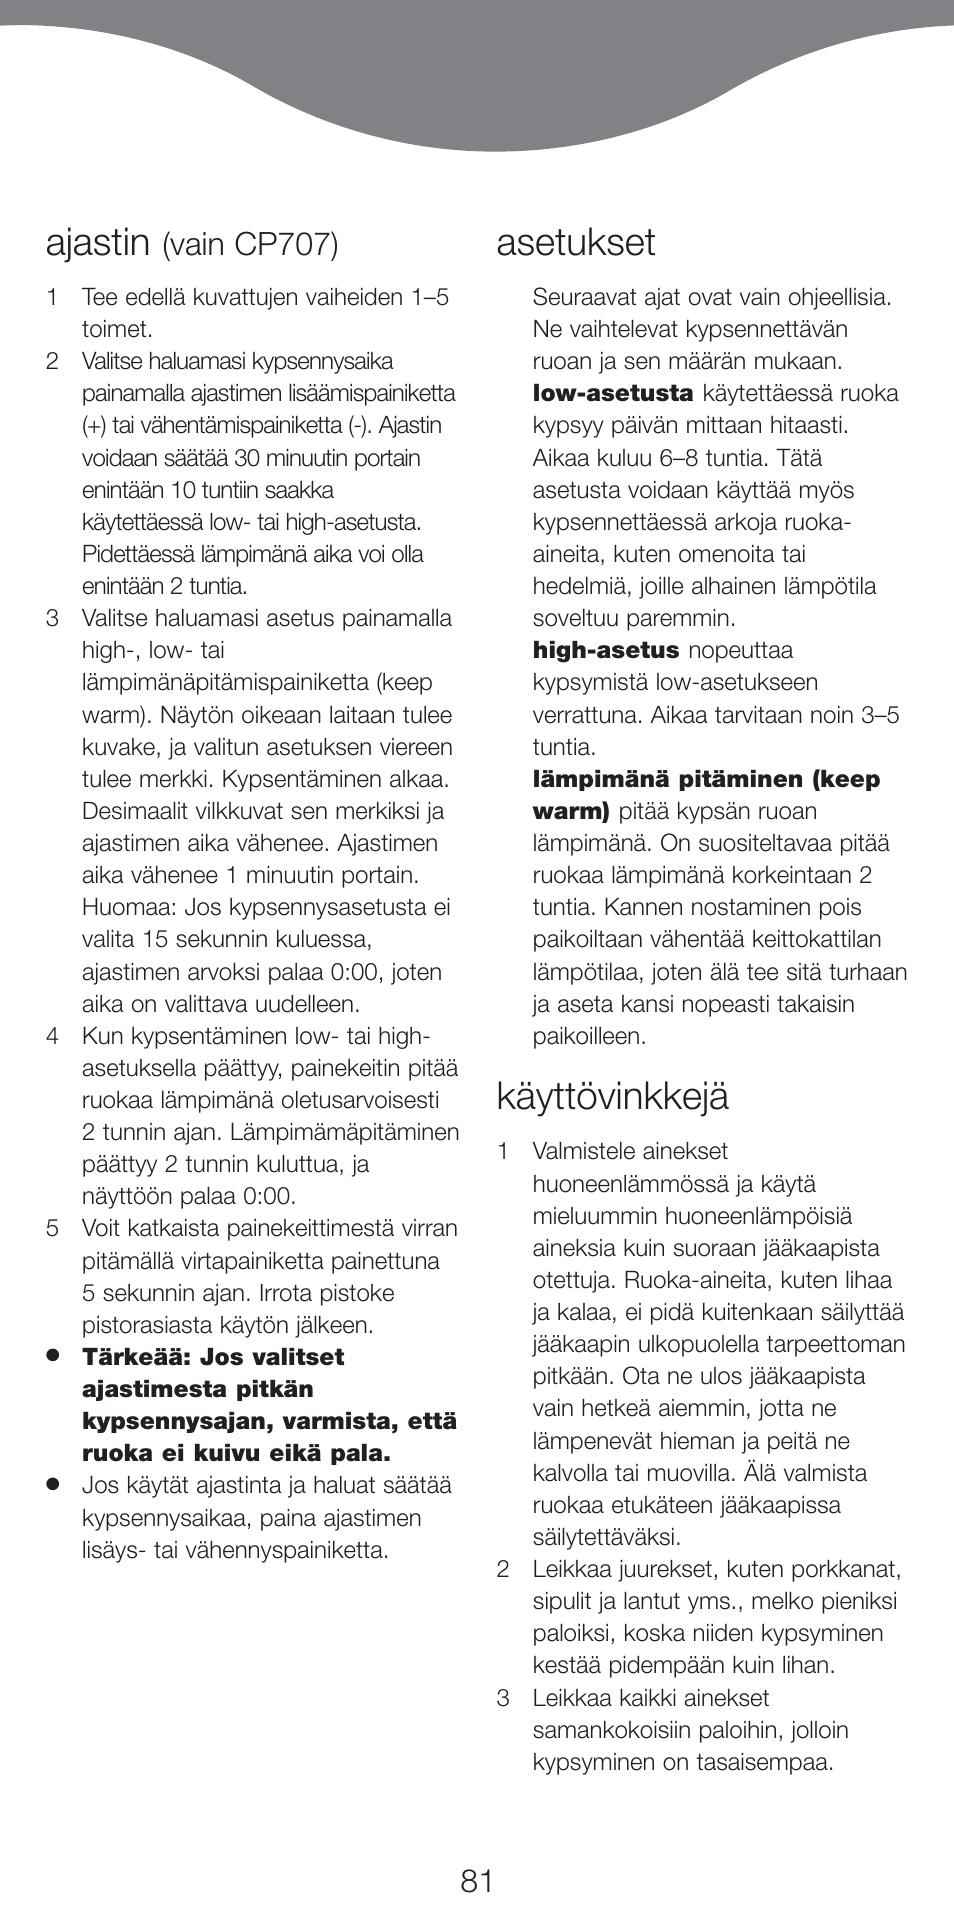 ajastin asetukset k ytt vinkkej kenwood cp707 user manual rh manualsdir com Kenwood Manual DPX-400 Kenwood Manual DPX-400